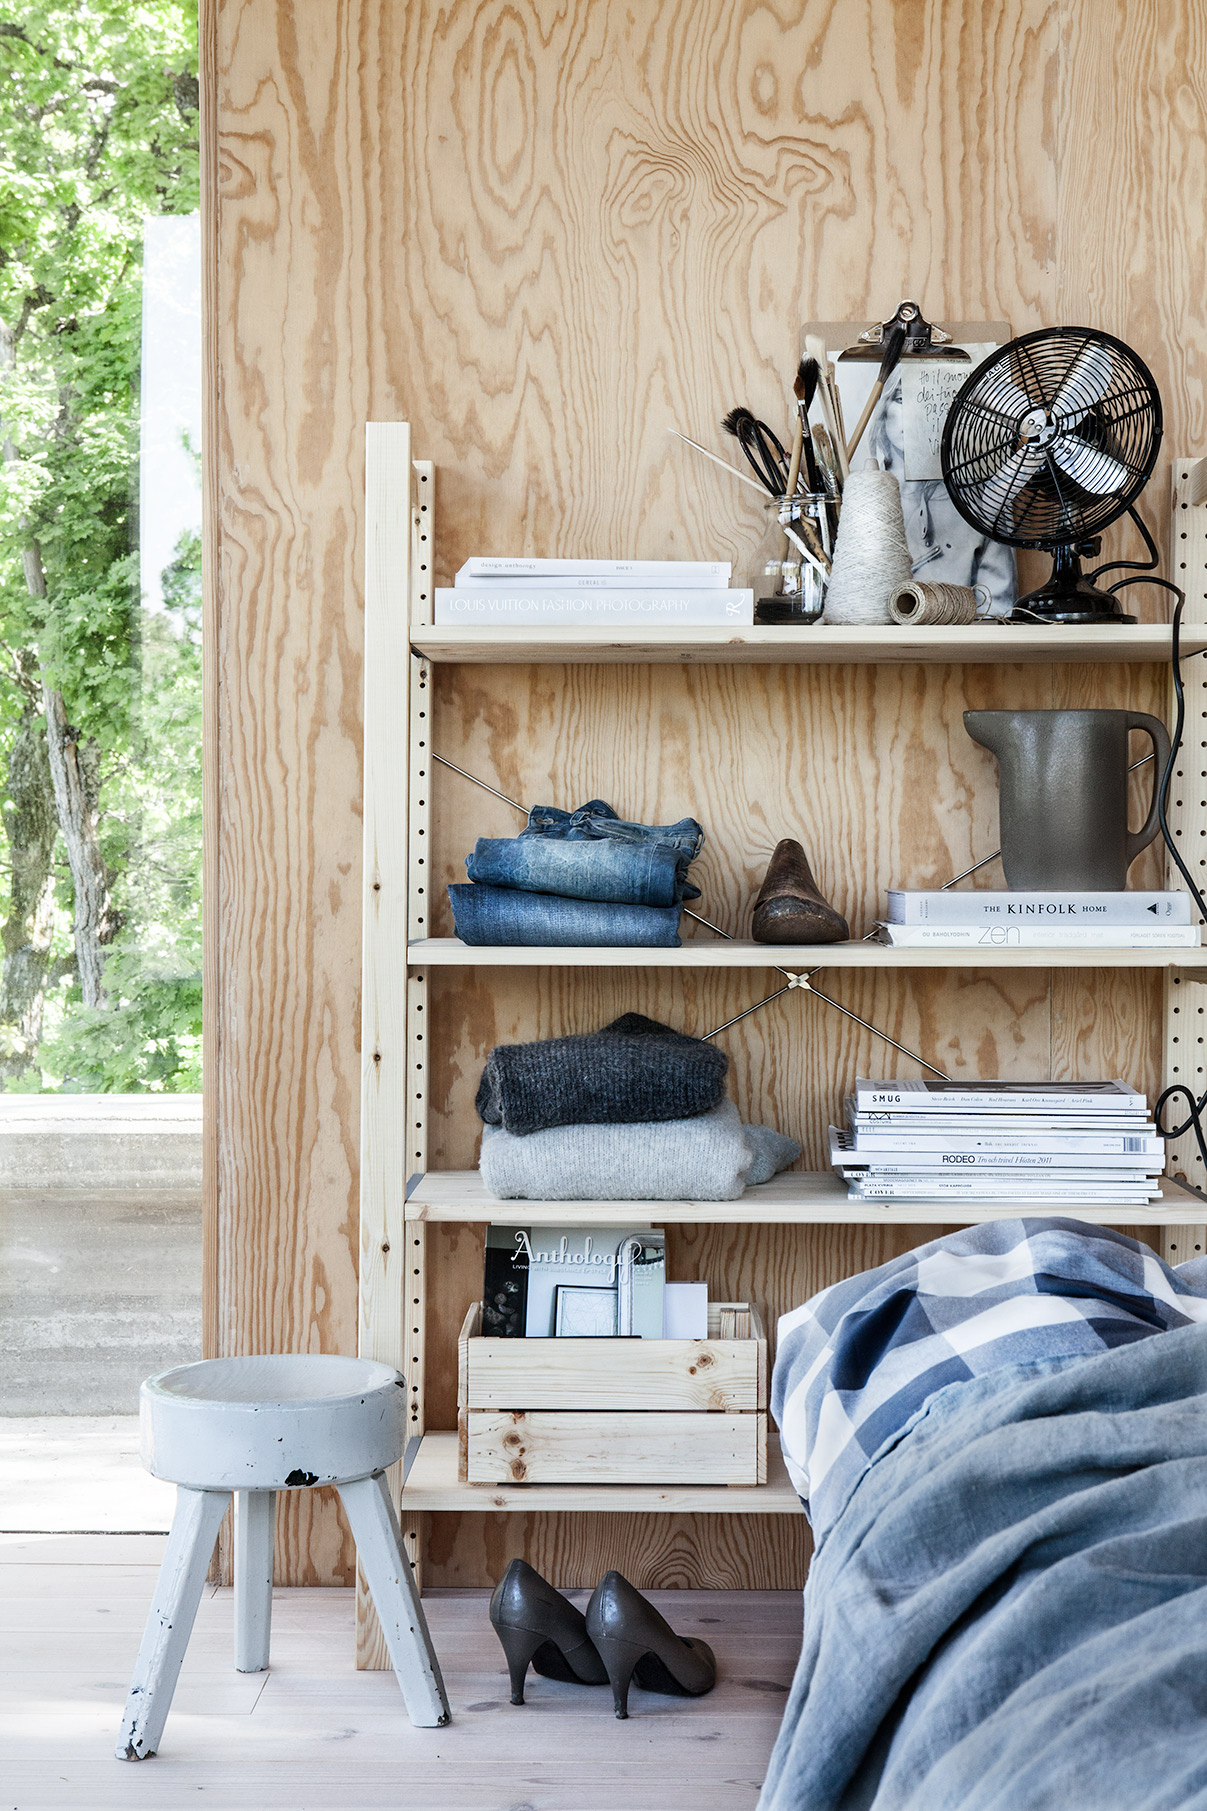 Trasmak i kubik 075 IKEA Livet Hemma copyright 2016 Anna Malmberg